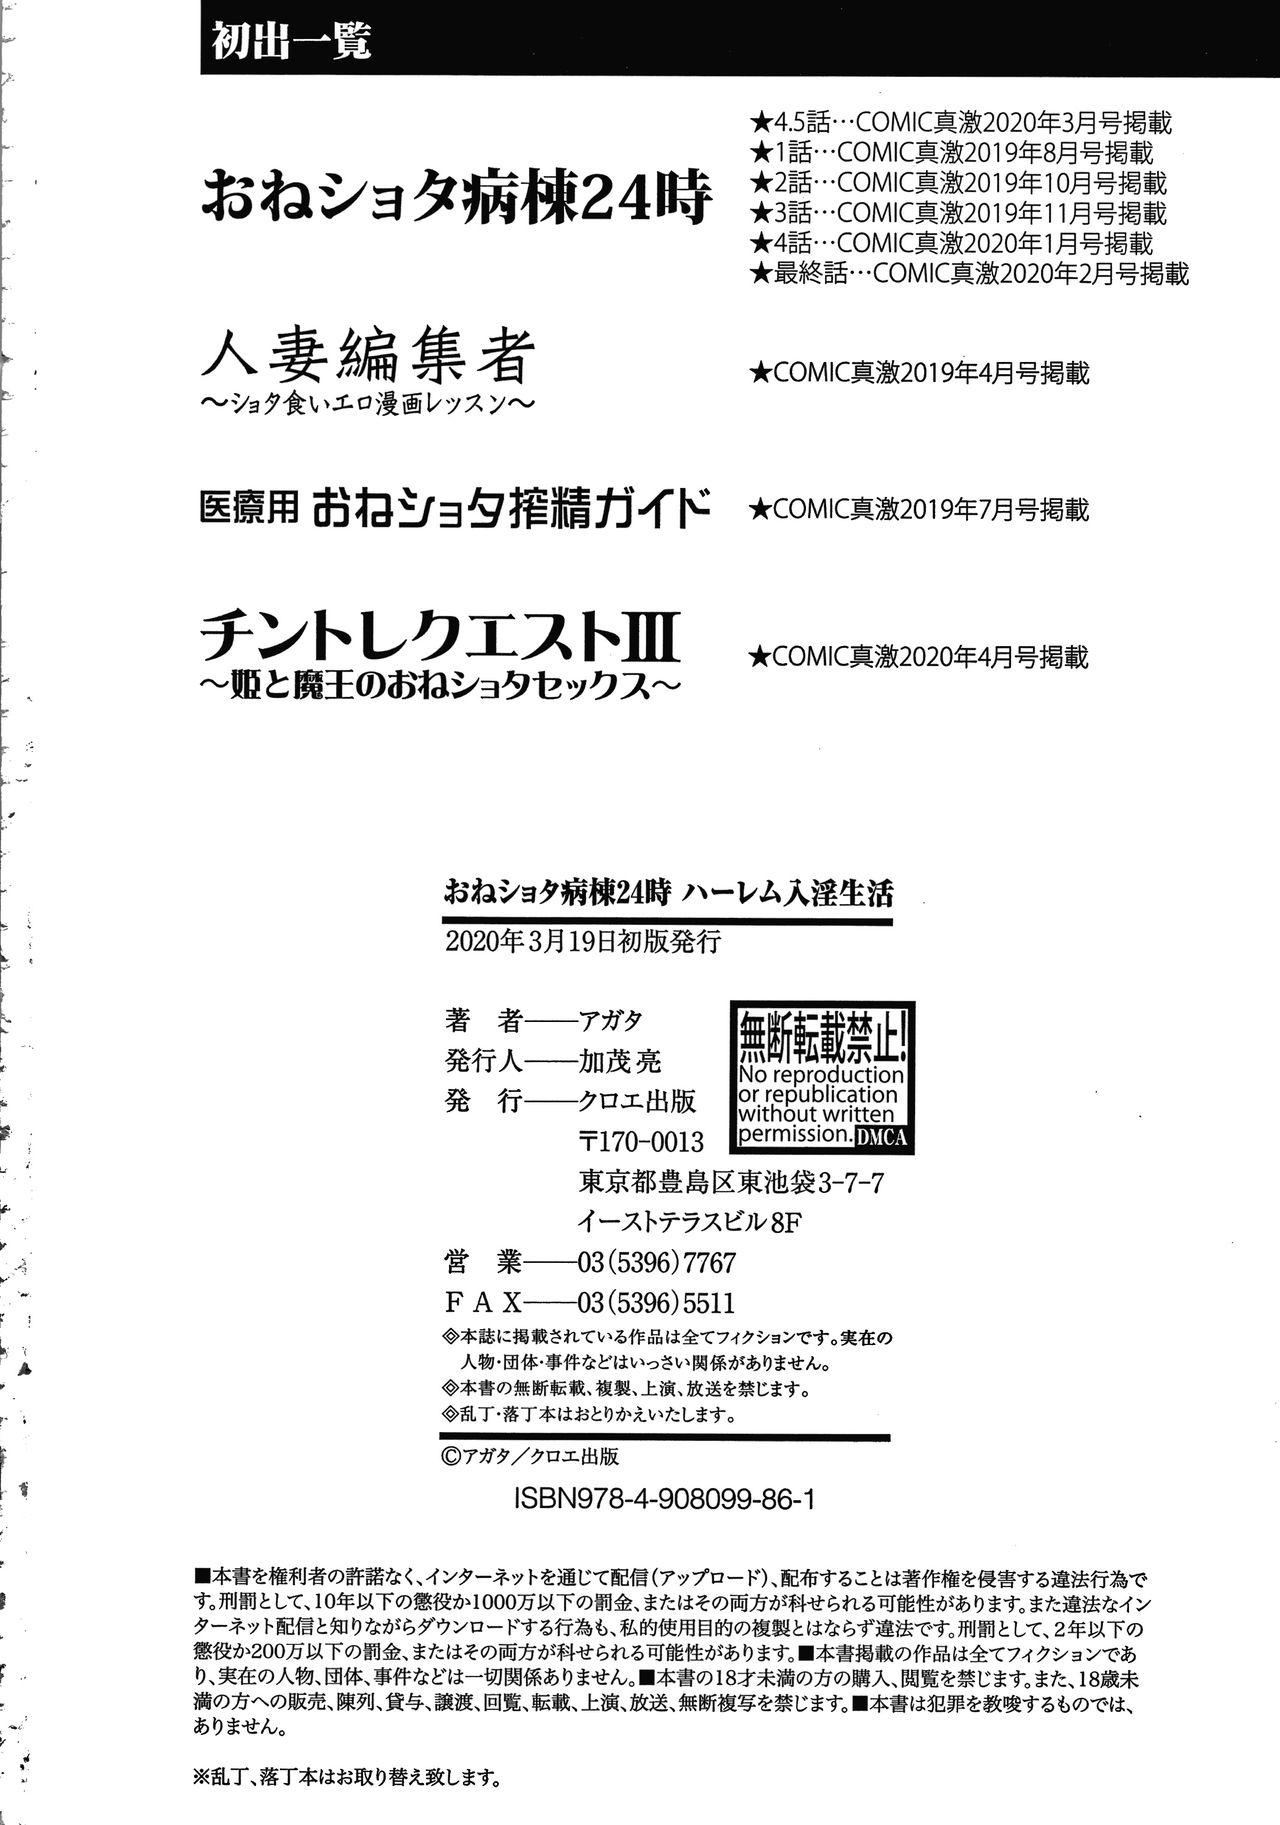 OneShota Byoutou 24-ji Harem Nyuuin Seikatsu | OneShota Ward 24 Hour Care Harem Hospitalization Life 52